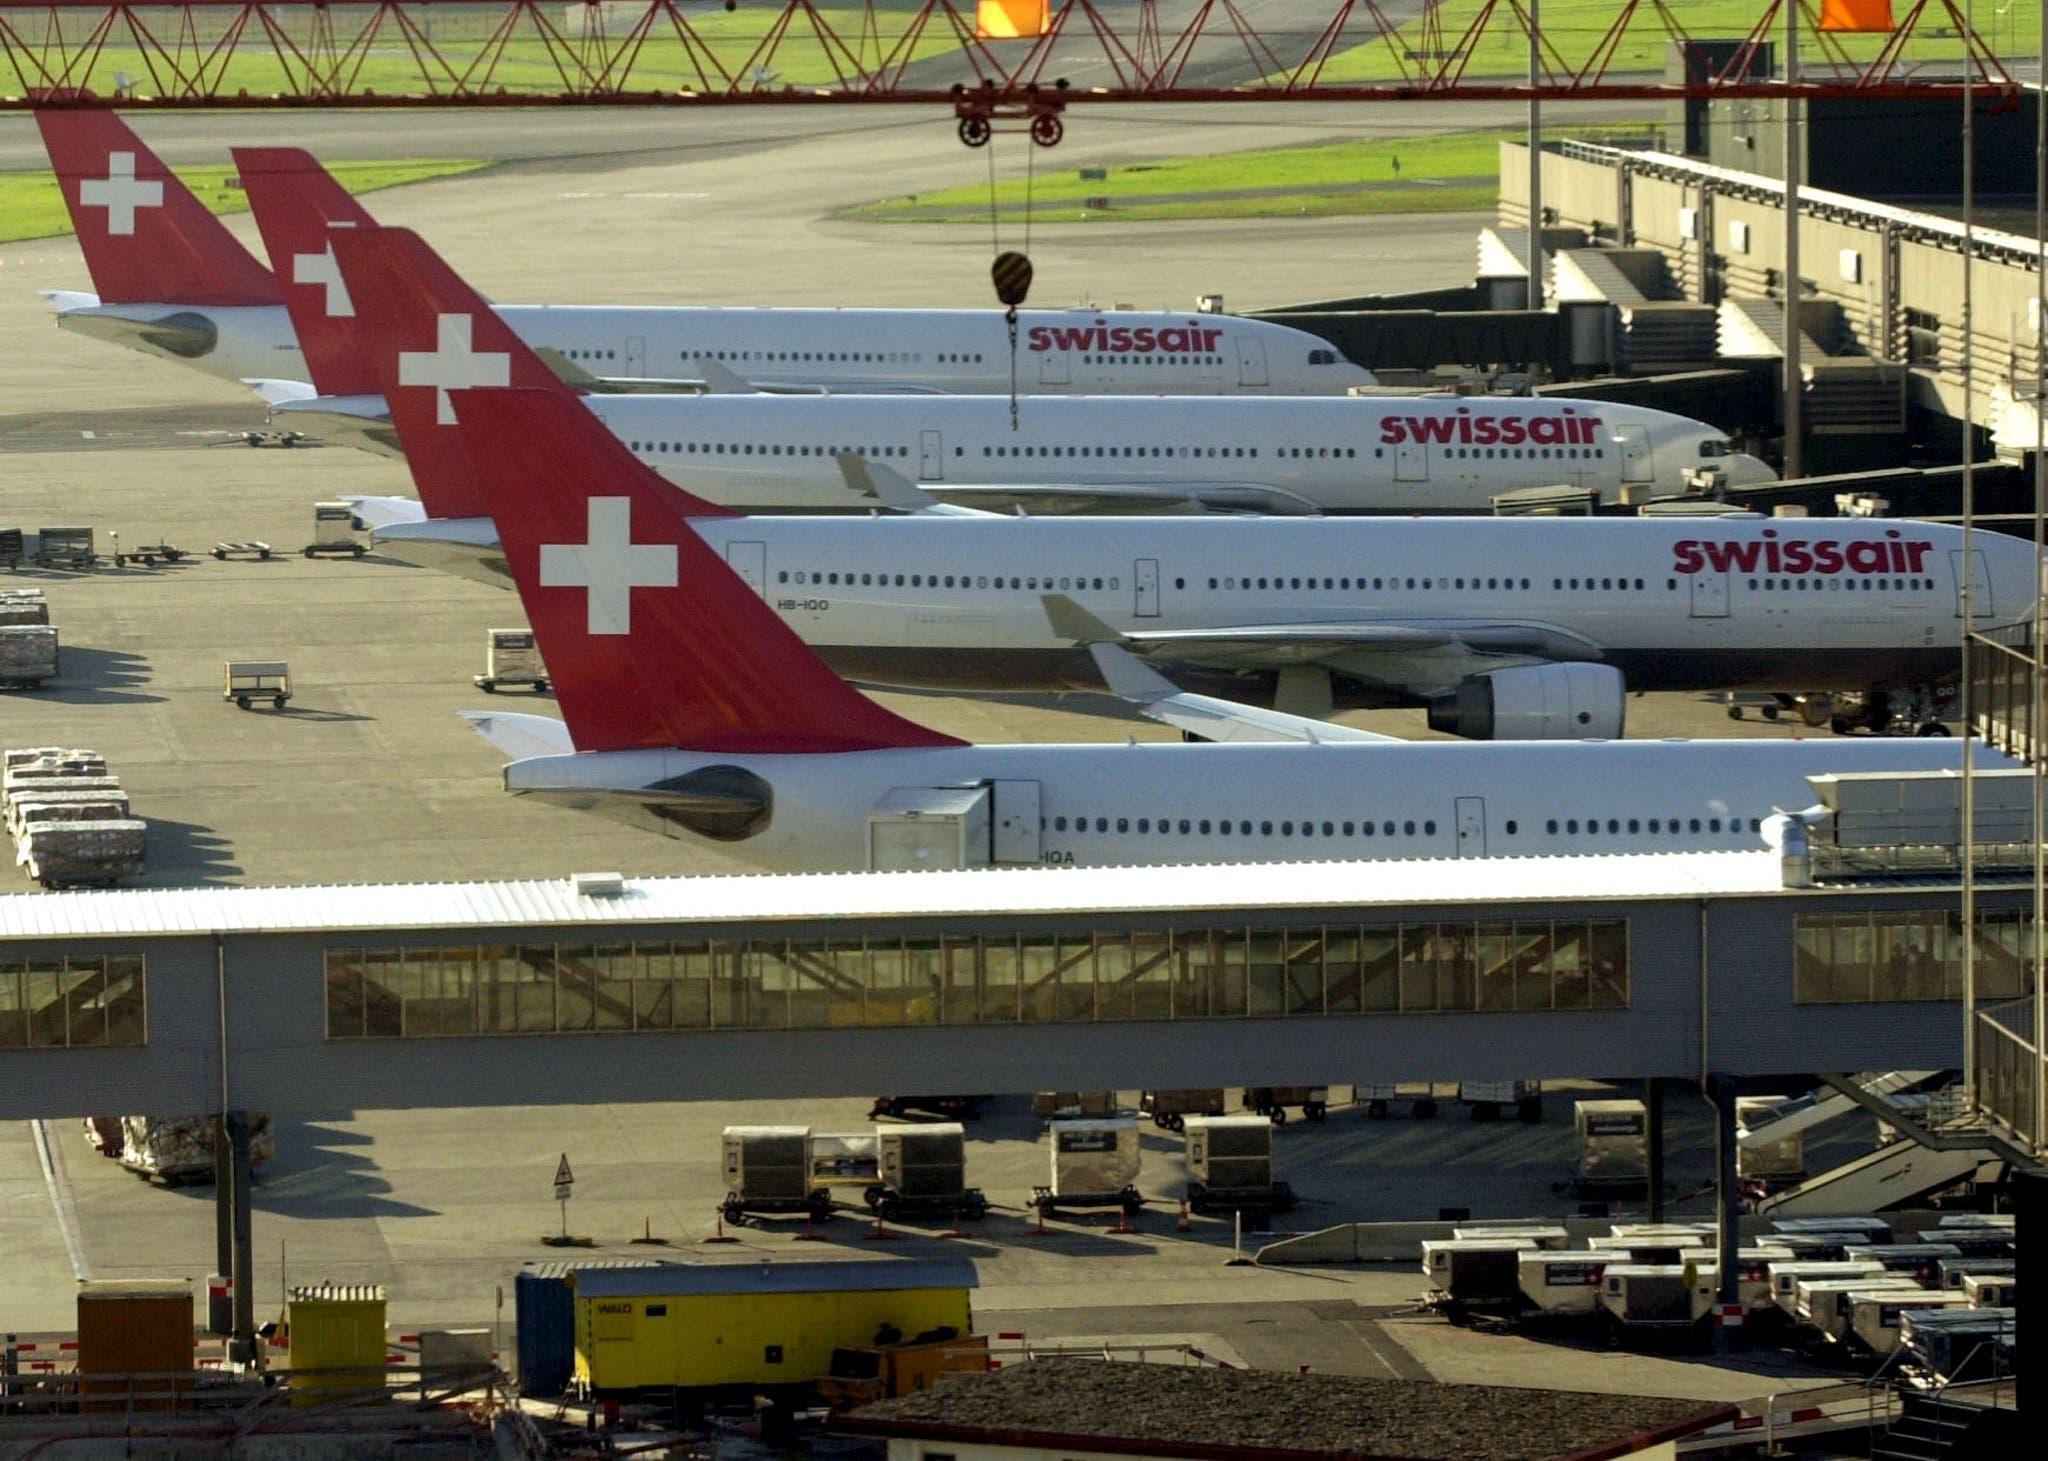 2. Oktober 2001: Das Grounding – der Tag, an dem die gesamte Swissair-Flotte am Boden bleibt.